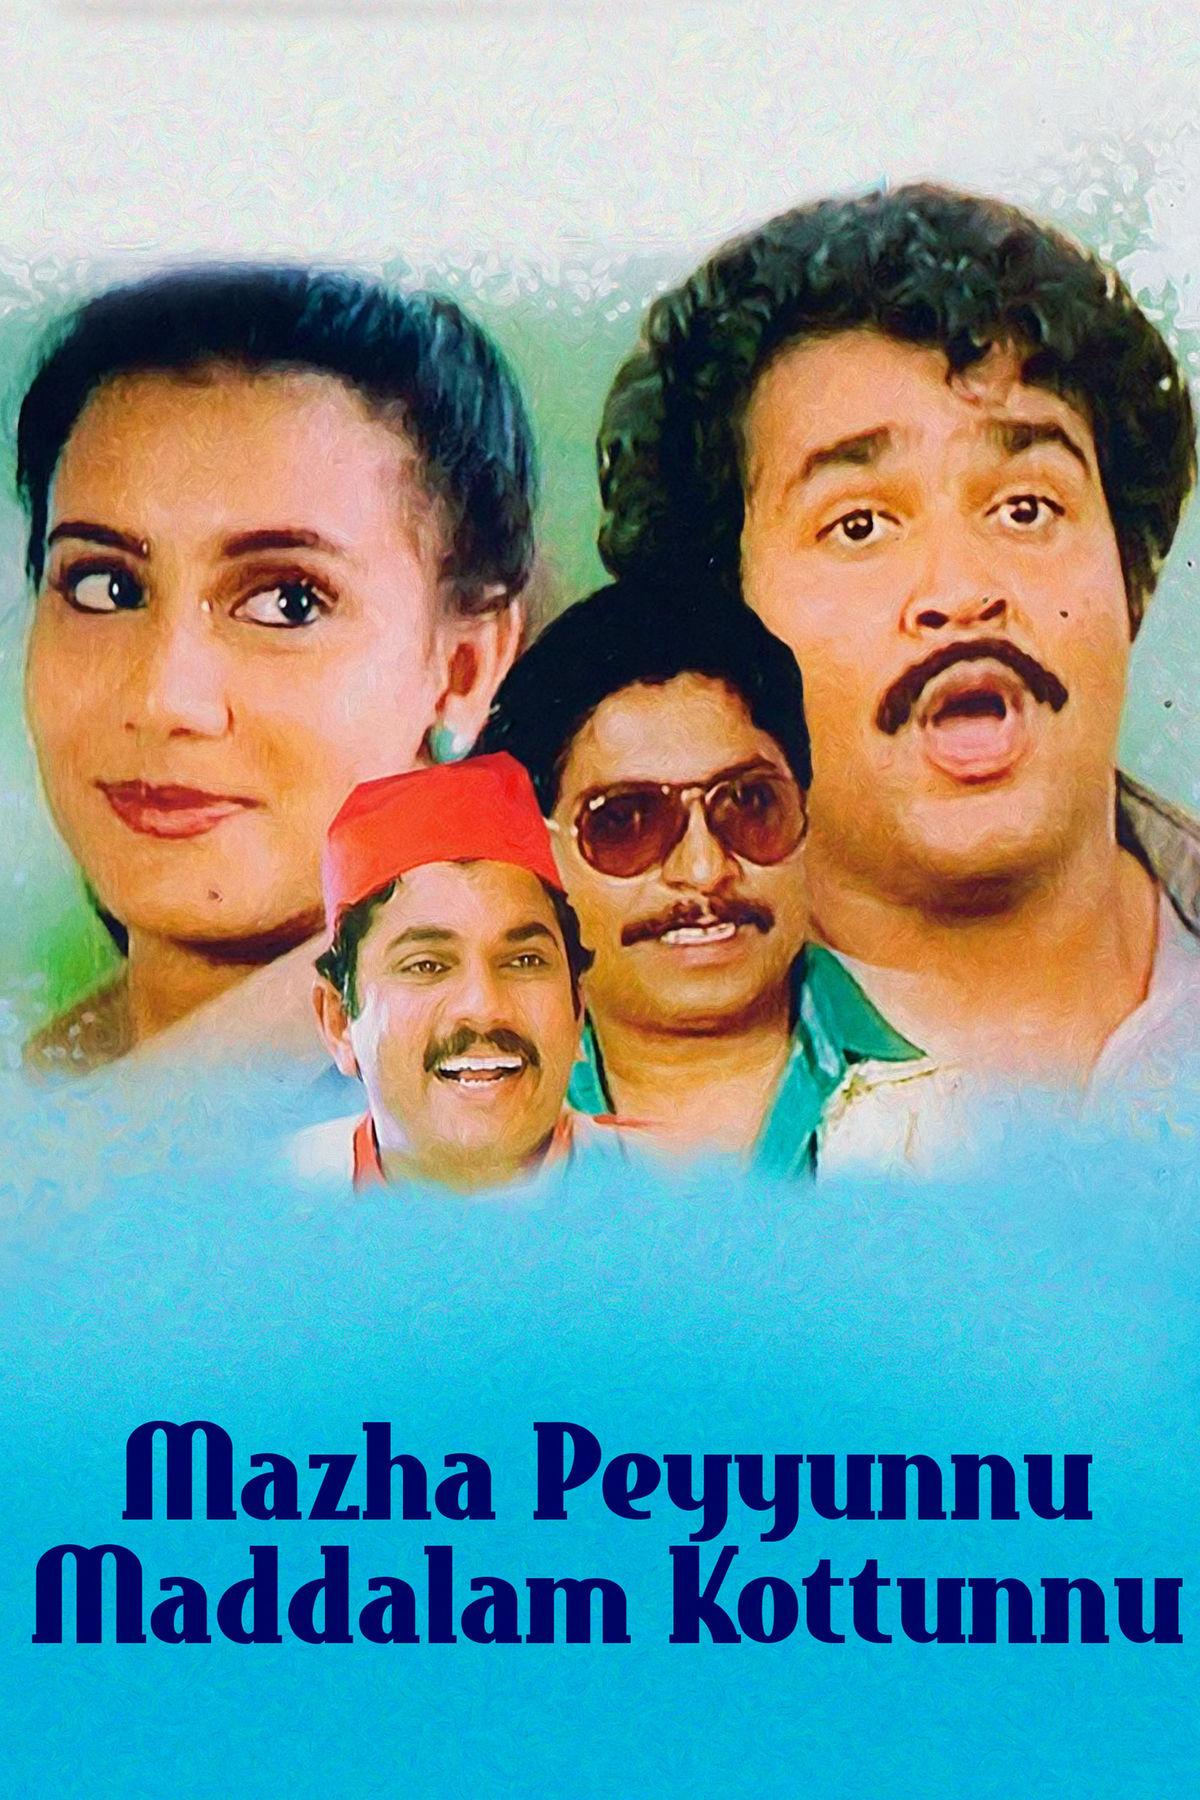 Jagathy Sreekumar Best Movies, TV Shows and Web Series List